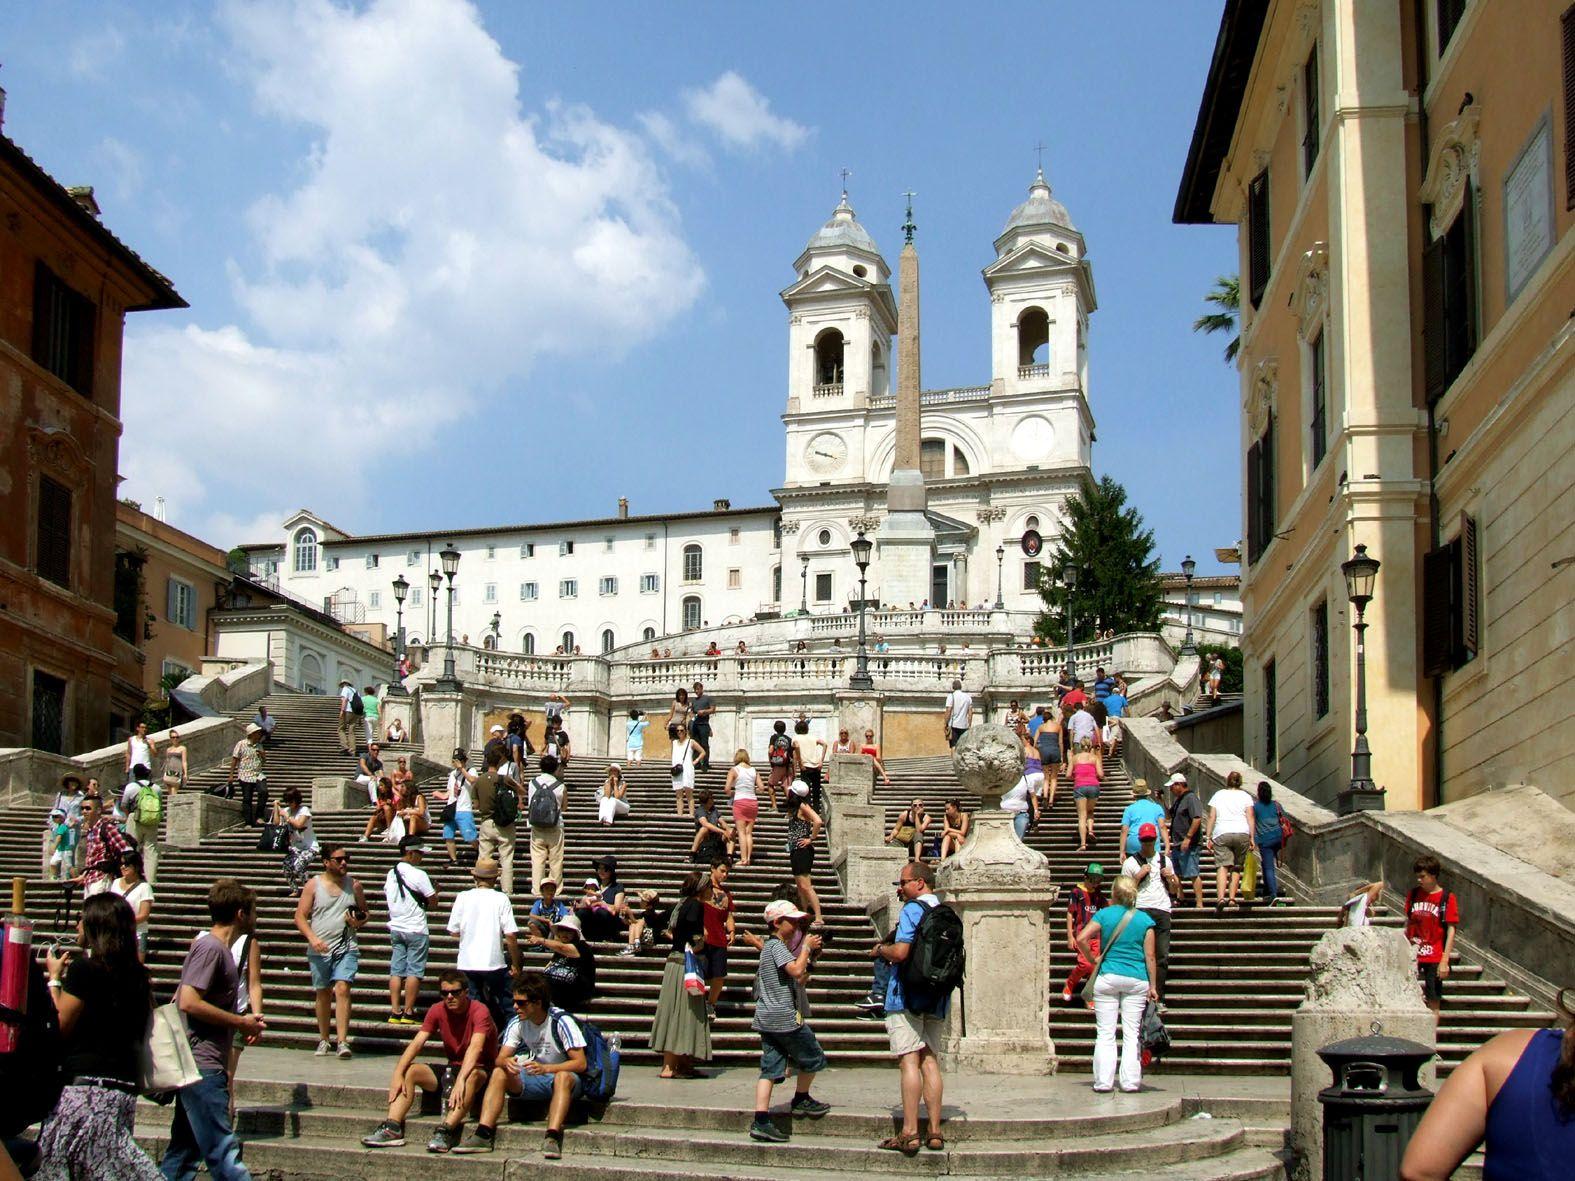 Piazza Di Spagna Und Umgebung Spanische Treppe Umgebung Besichtigung